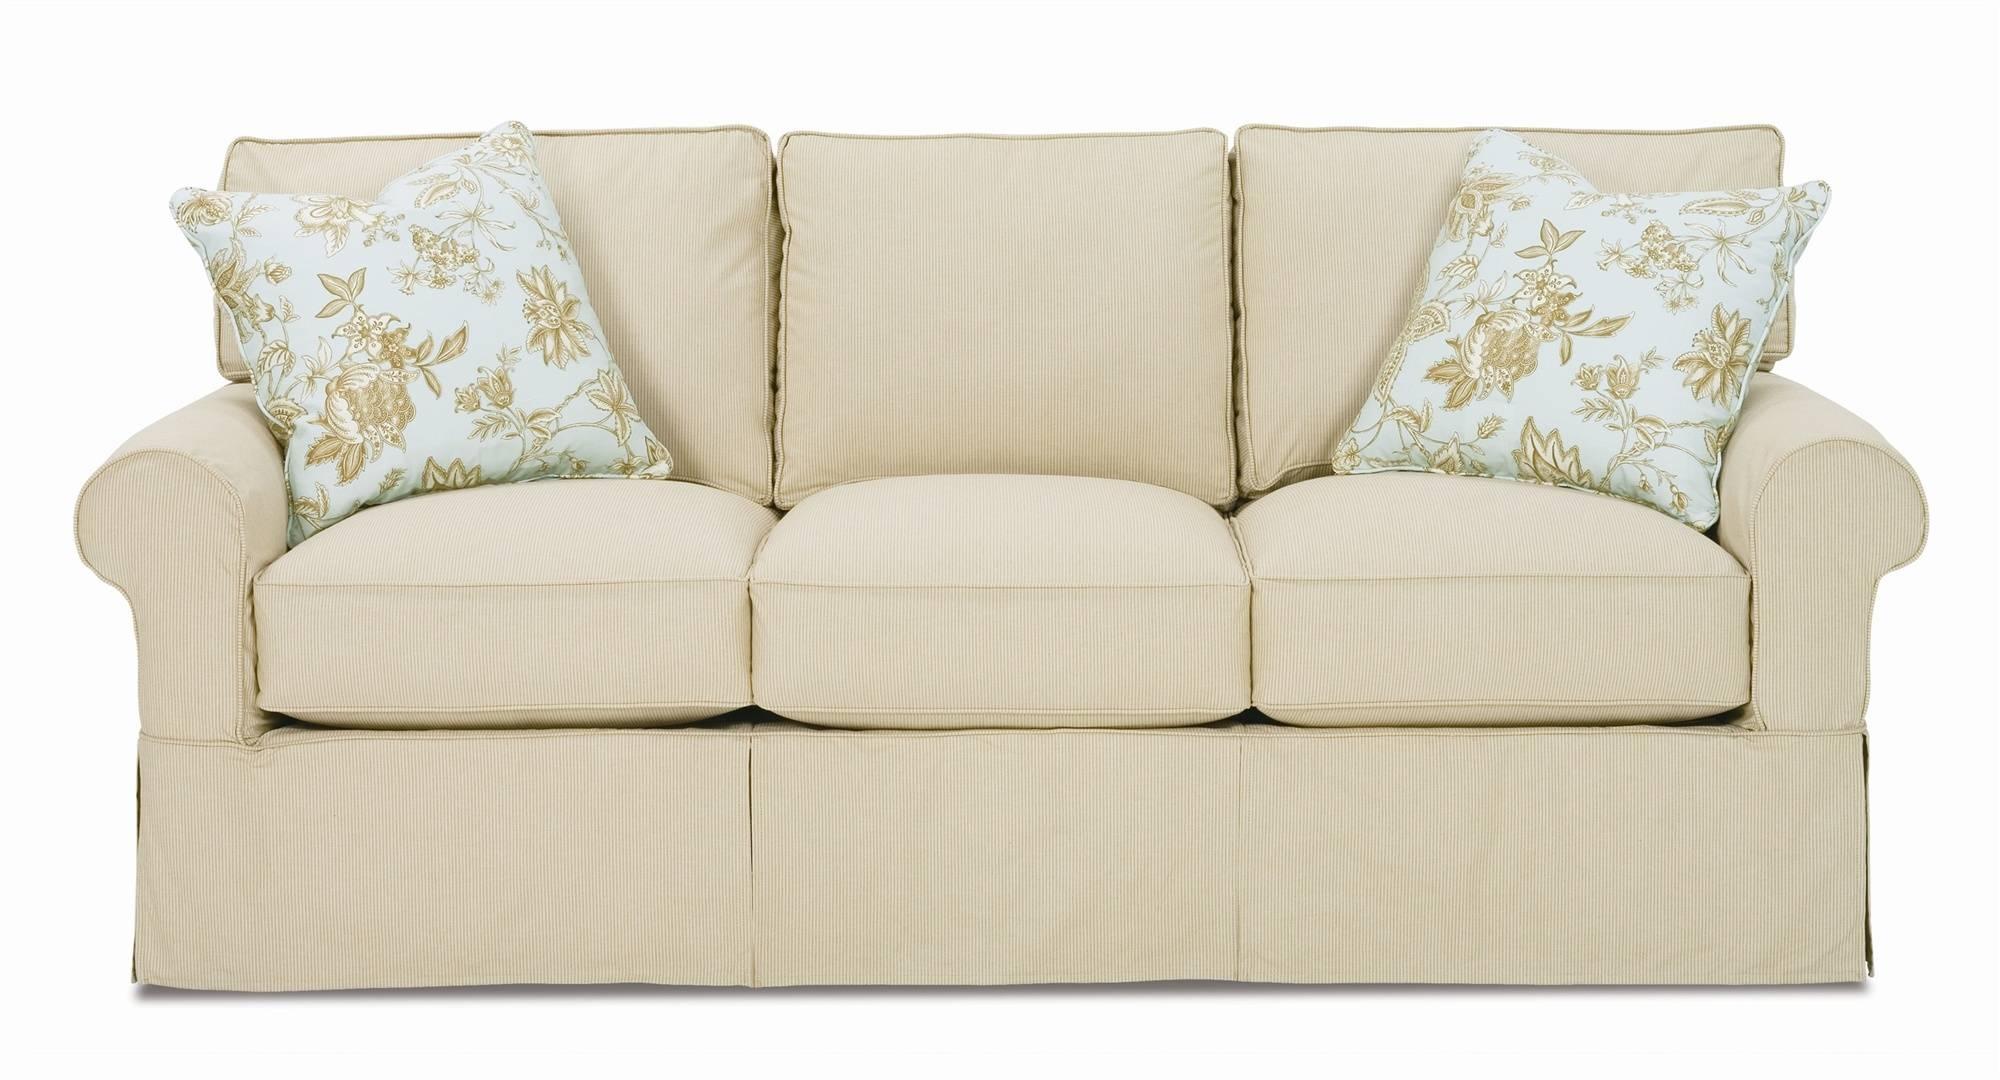 Quality Interiors | Sofa Slipcover | Chair Slipcovers regarding Shabby Chic Sofa Slipcovers (Image 6 of 15)